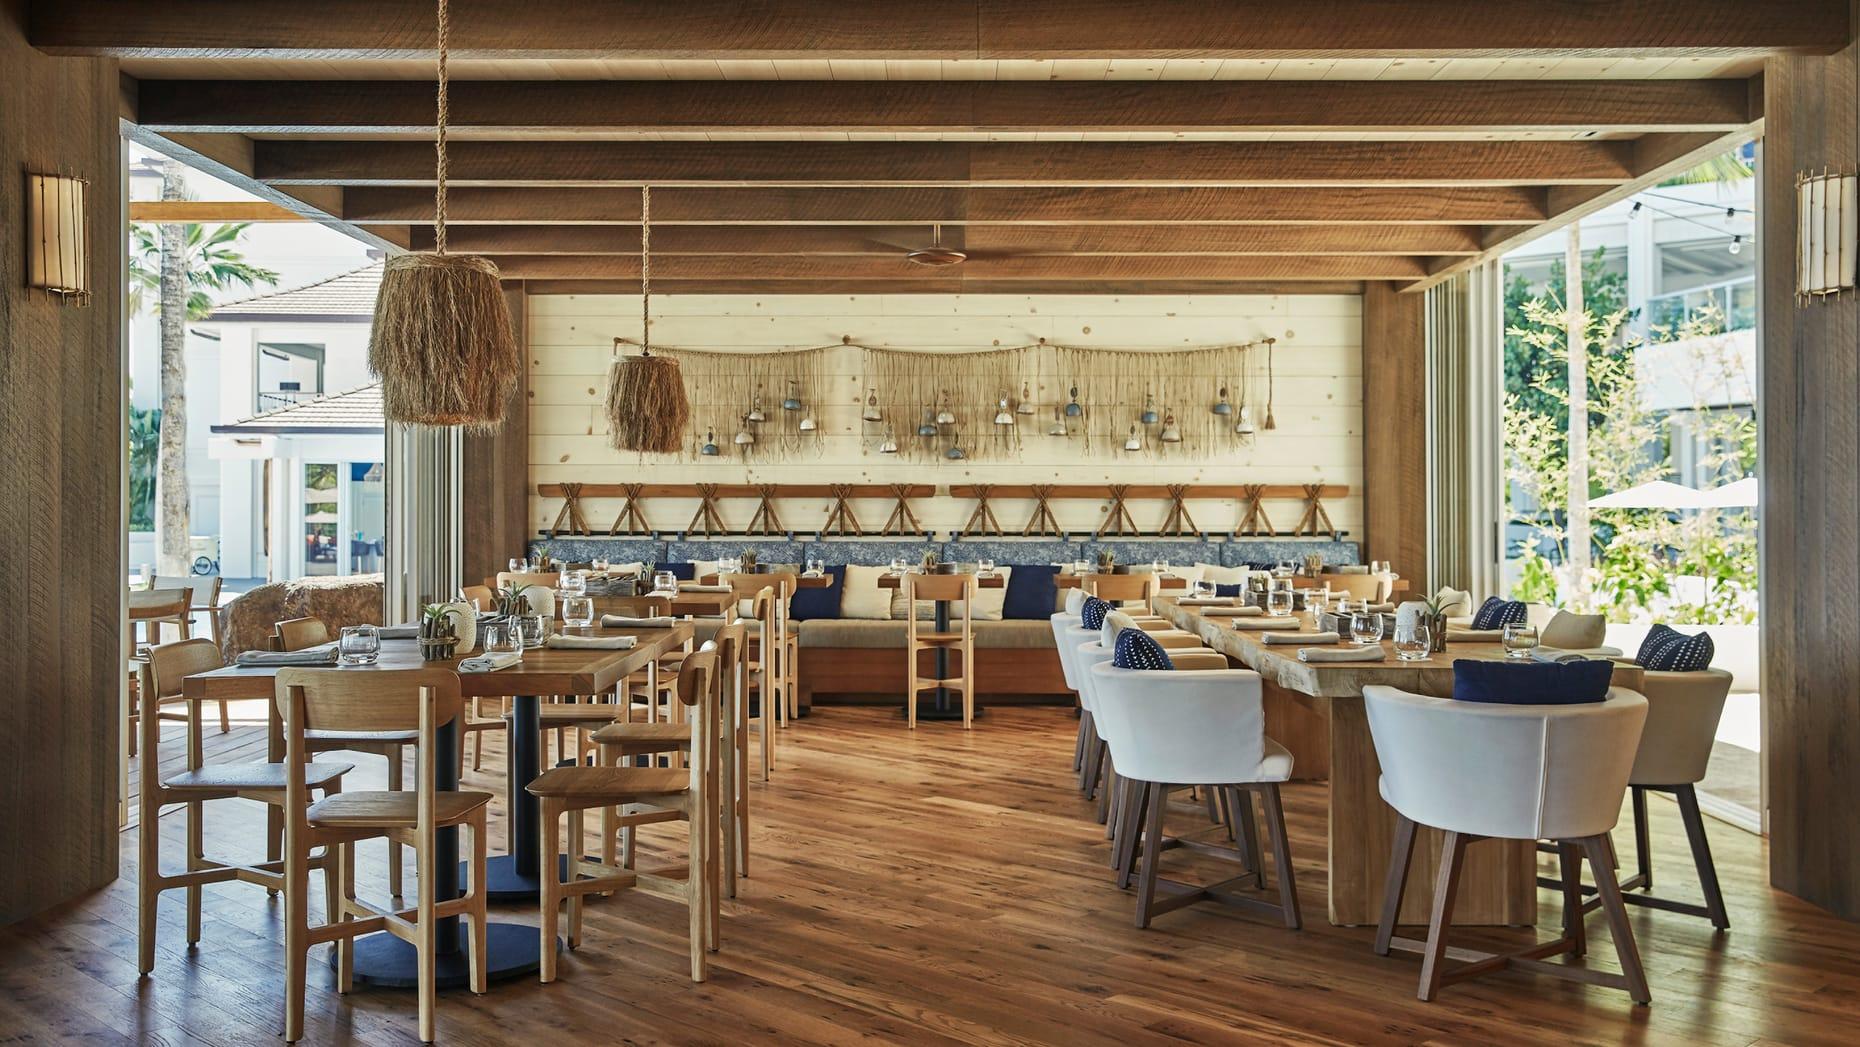 minas fish house - four seasons oahu - restaurantes oahu - onde comer havai